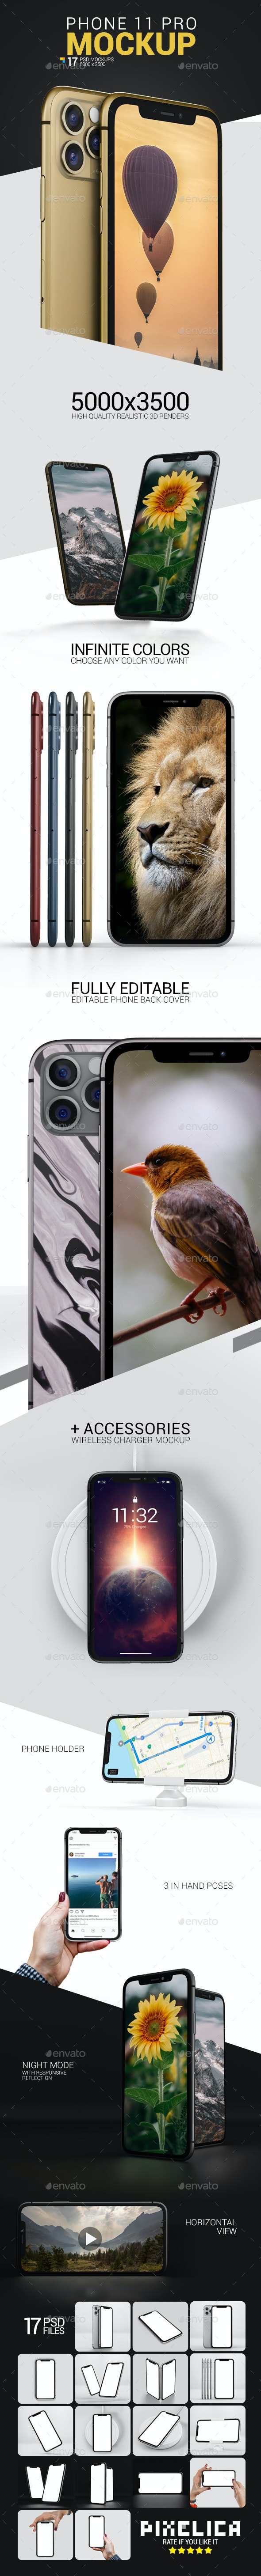 Phone 11 Pro Mockup Pack - Product Mock-Ups Graphics